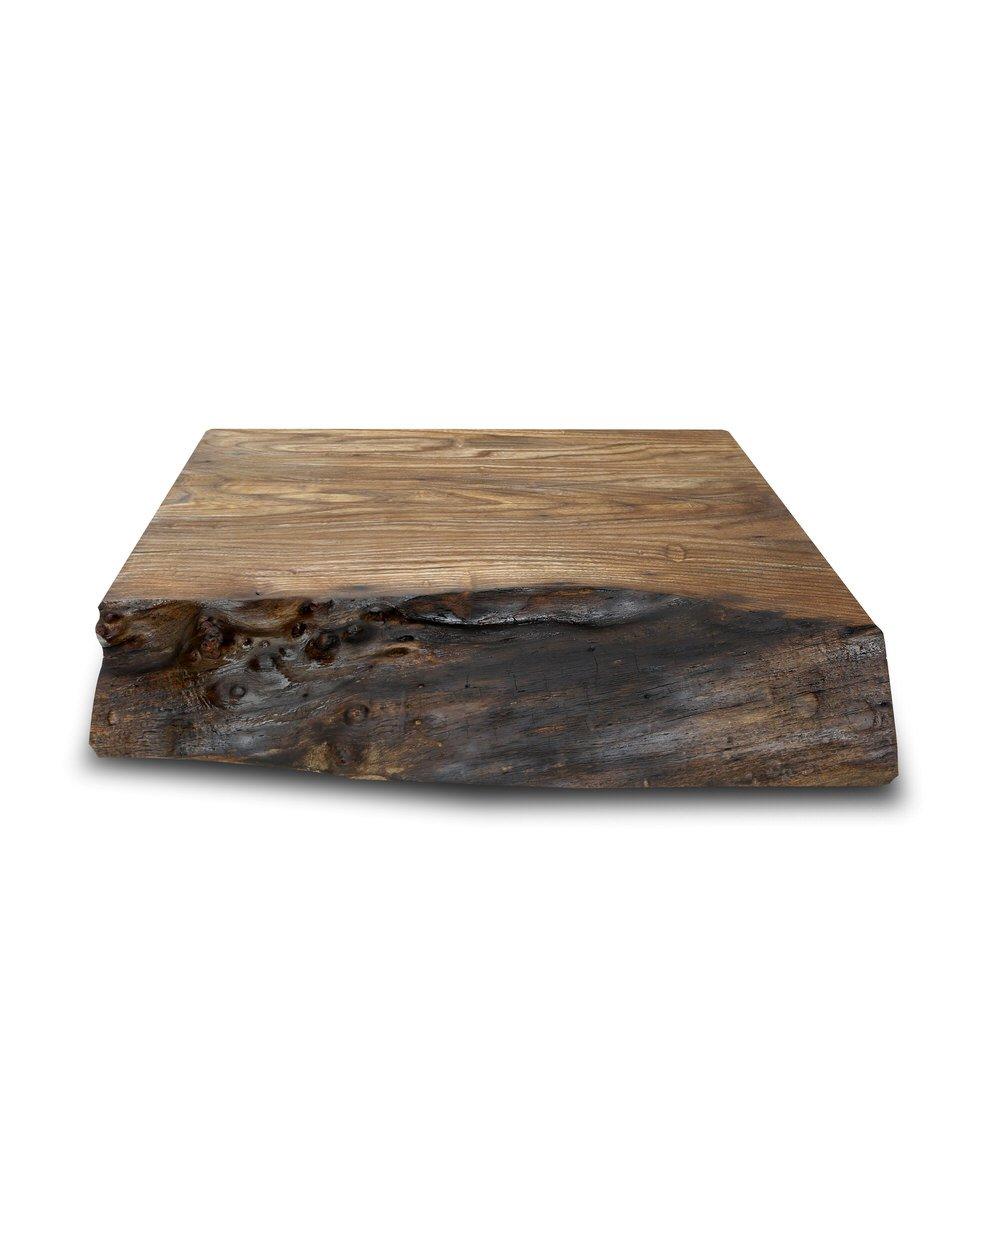 james martin style chopping board